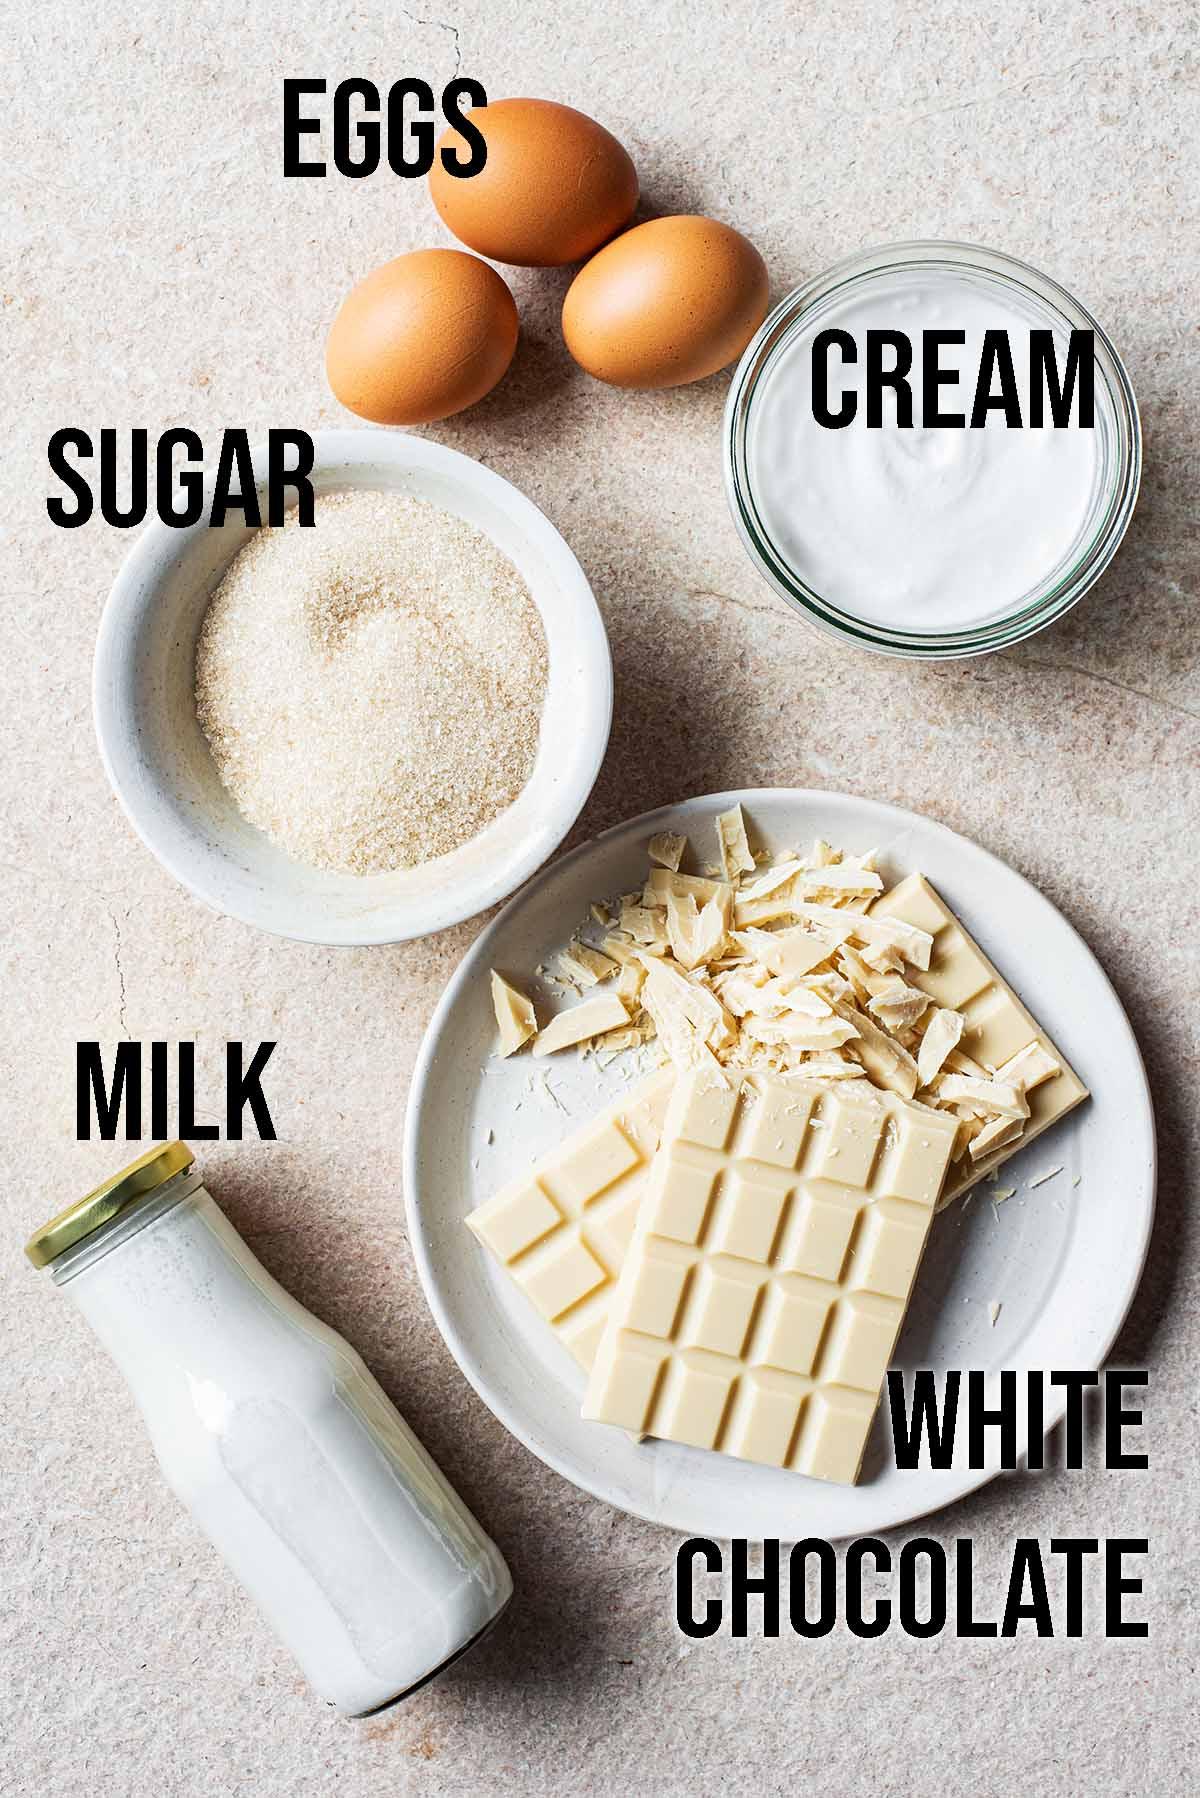 White Chocolate Ice Cream ingredients.